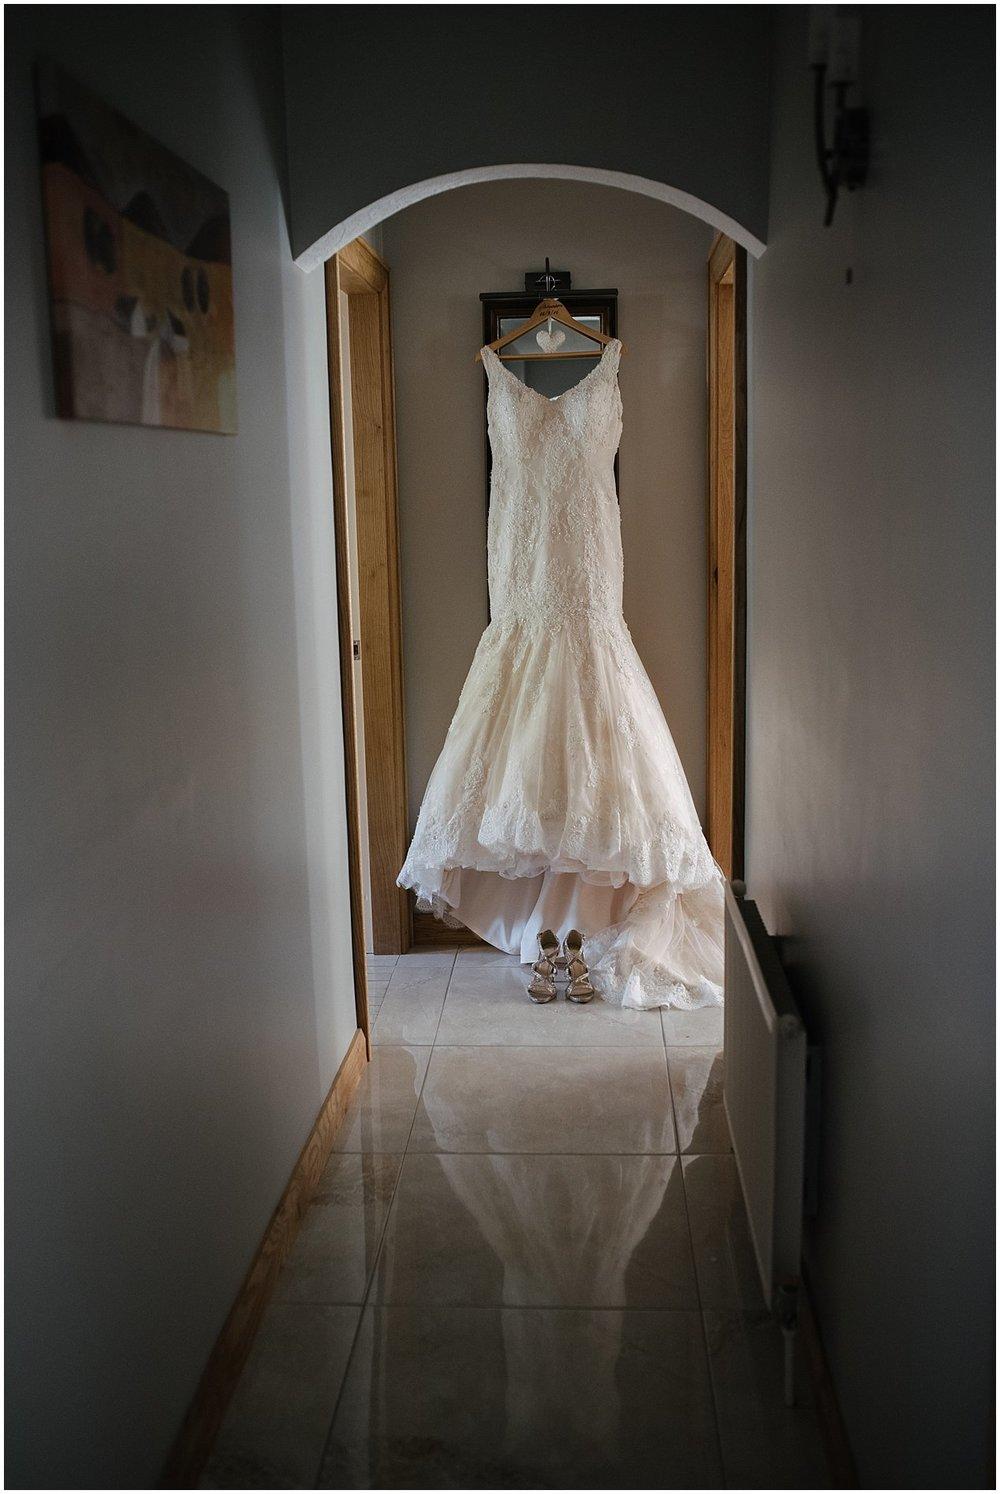 Shauneen_PJ_Hillgrove_Hotel_Monaghan_Wedding_jude_browne_photography_0077.jpg